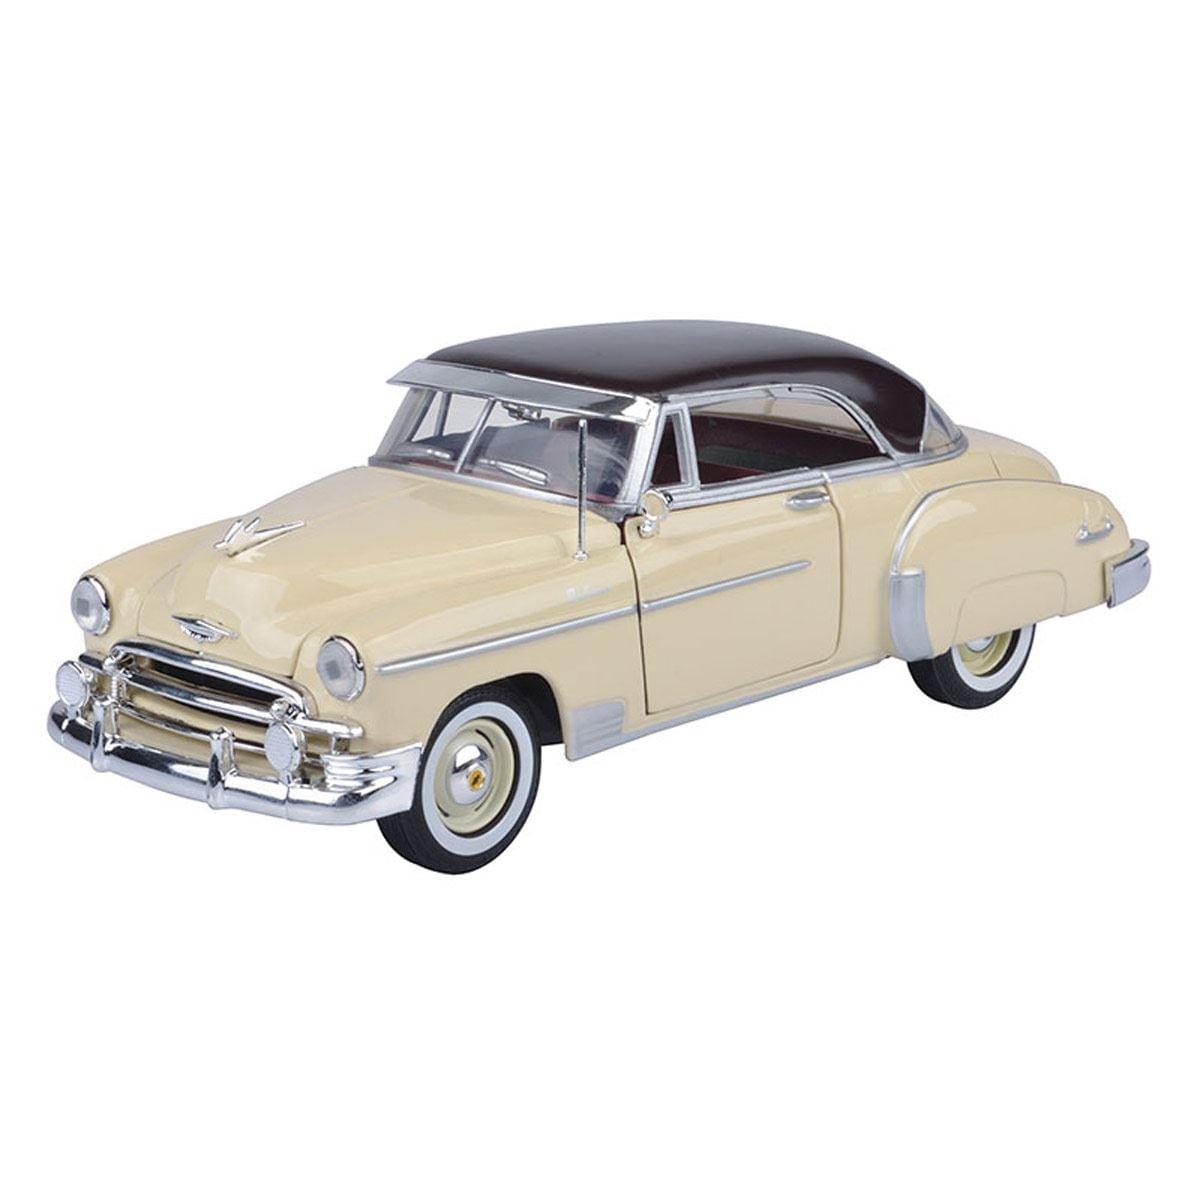 1950 Chevy Bel Air esc 1:24